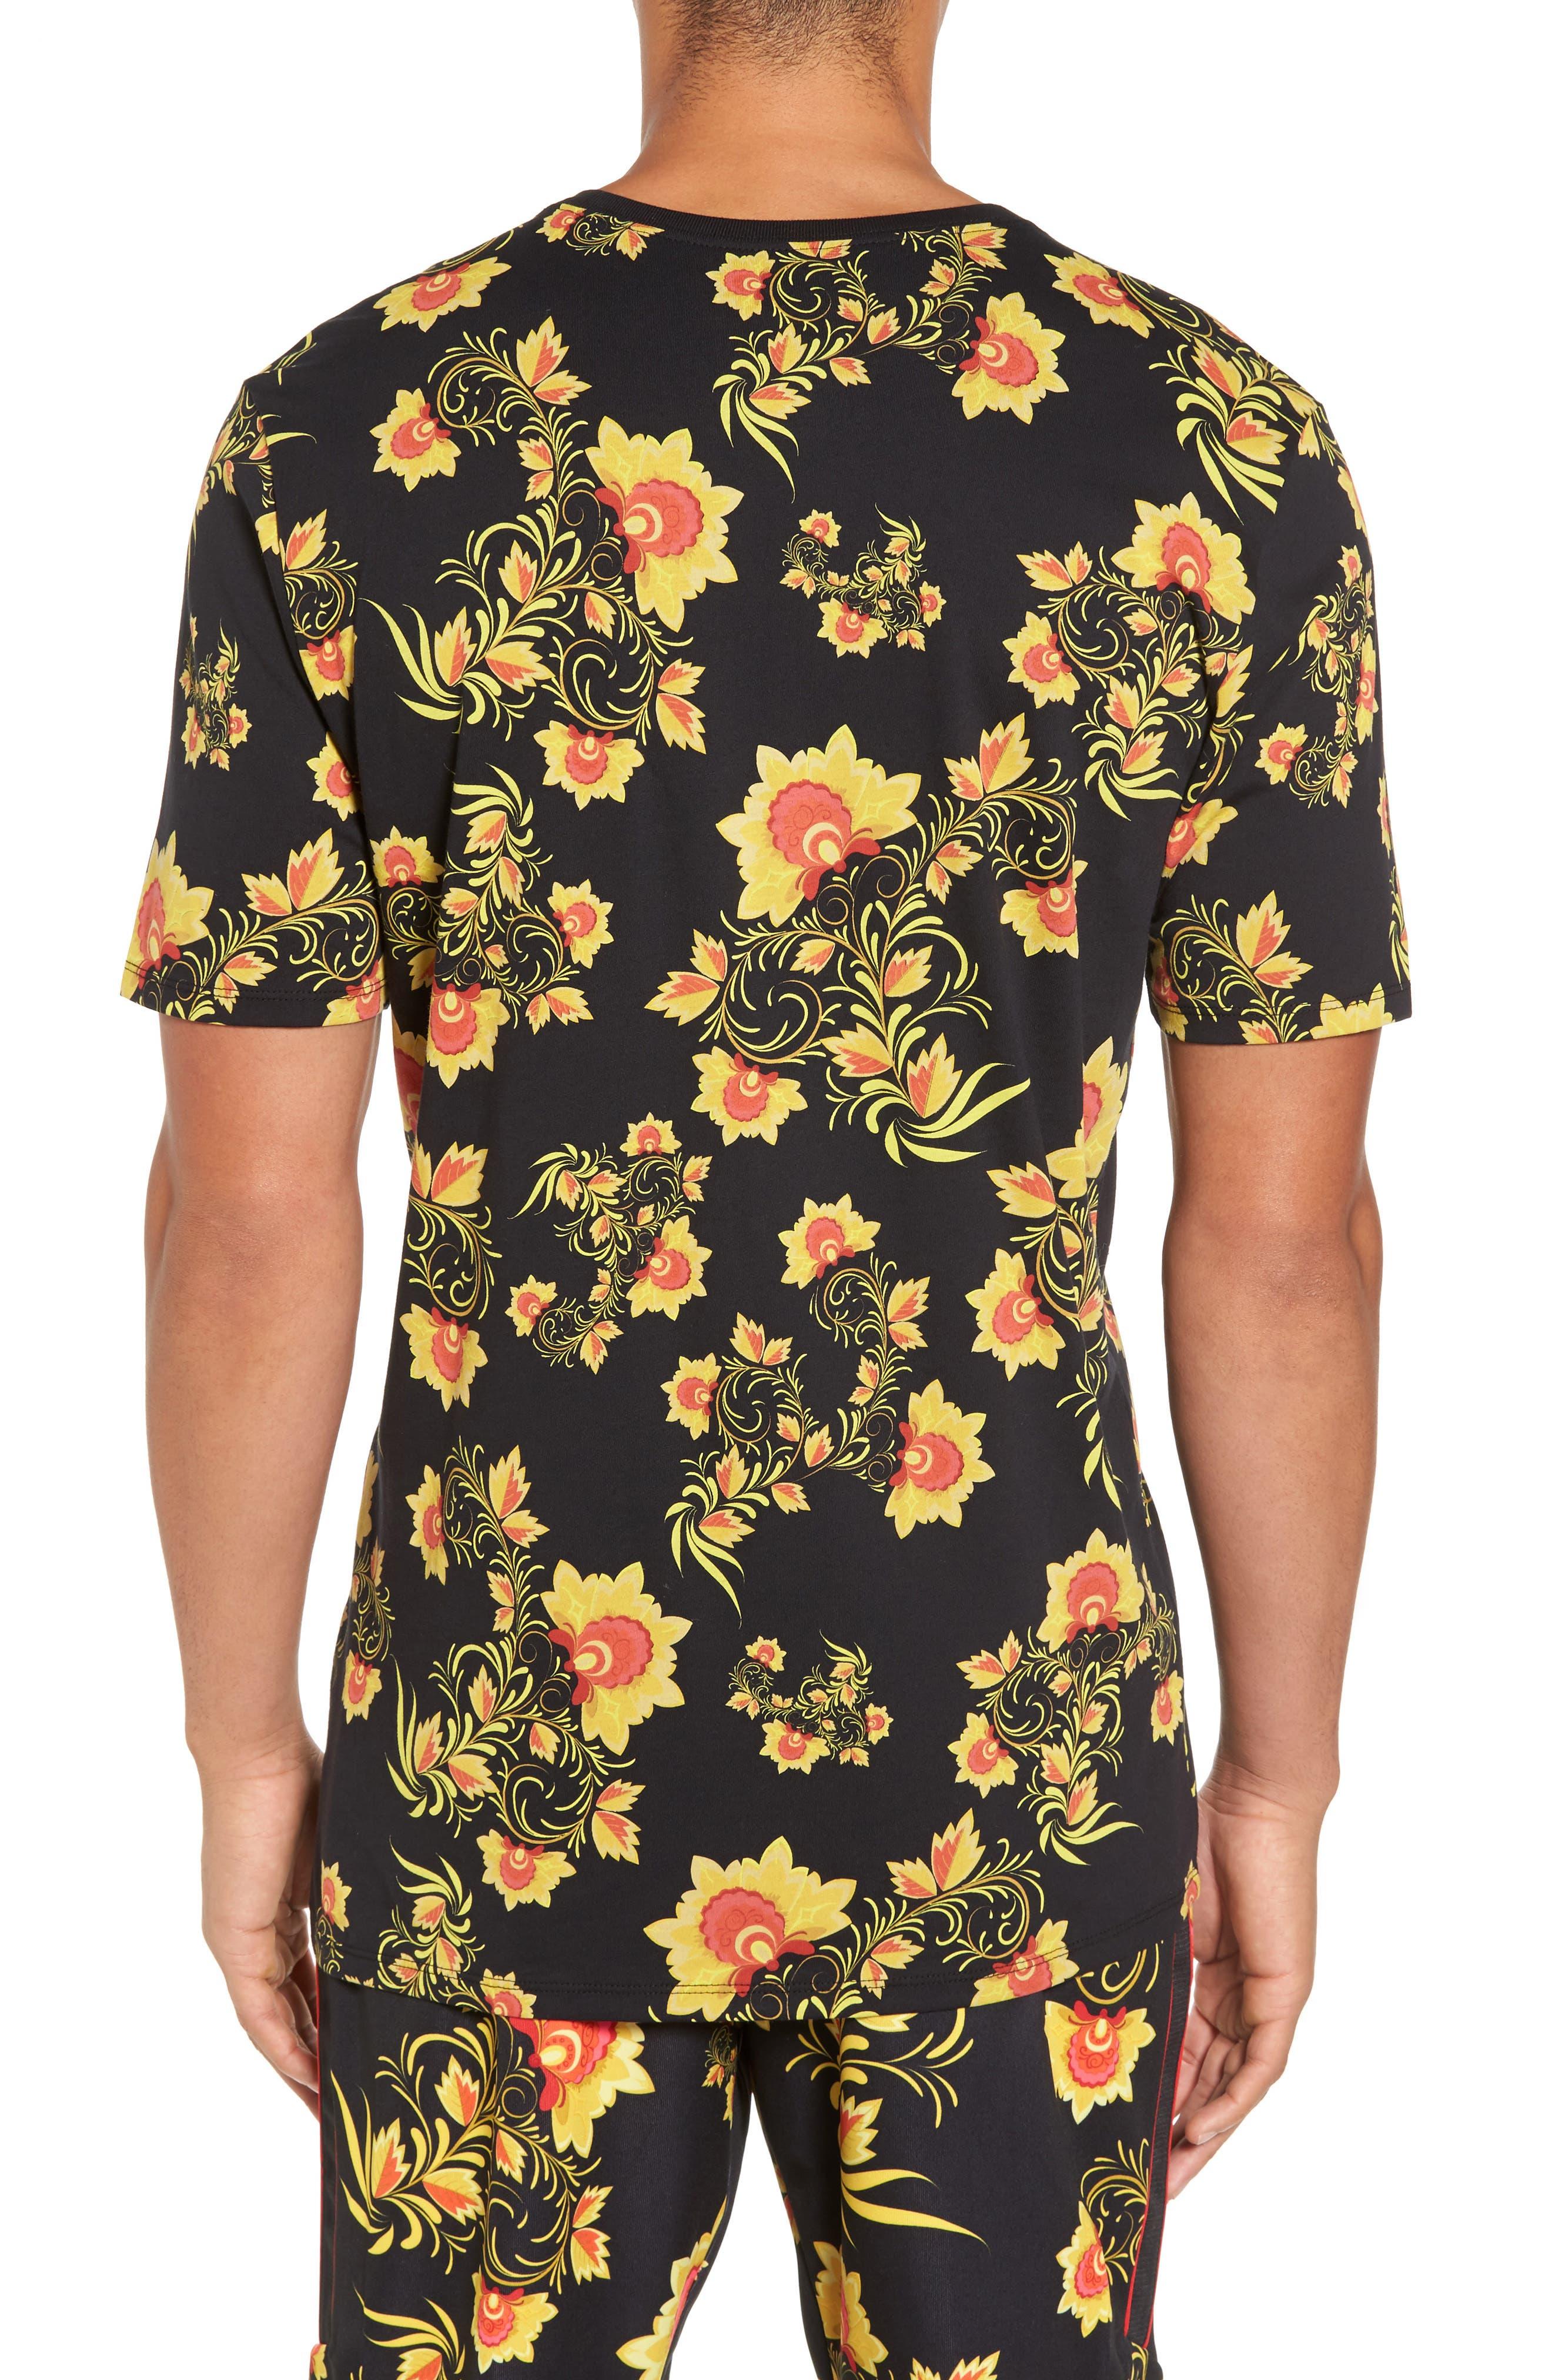 NSW Concept T-Shirt,                             Alternate thumbnail 2, color,                             Black/ Tour Yellow